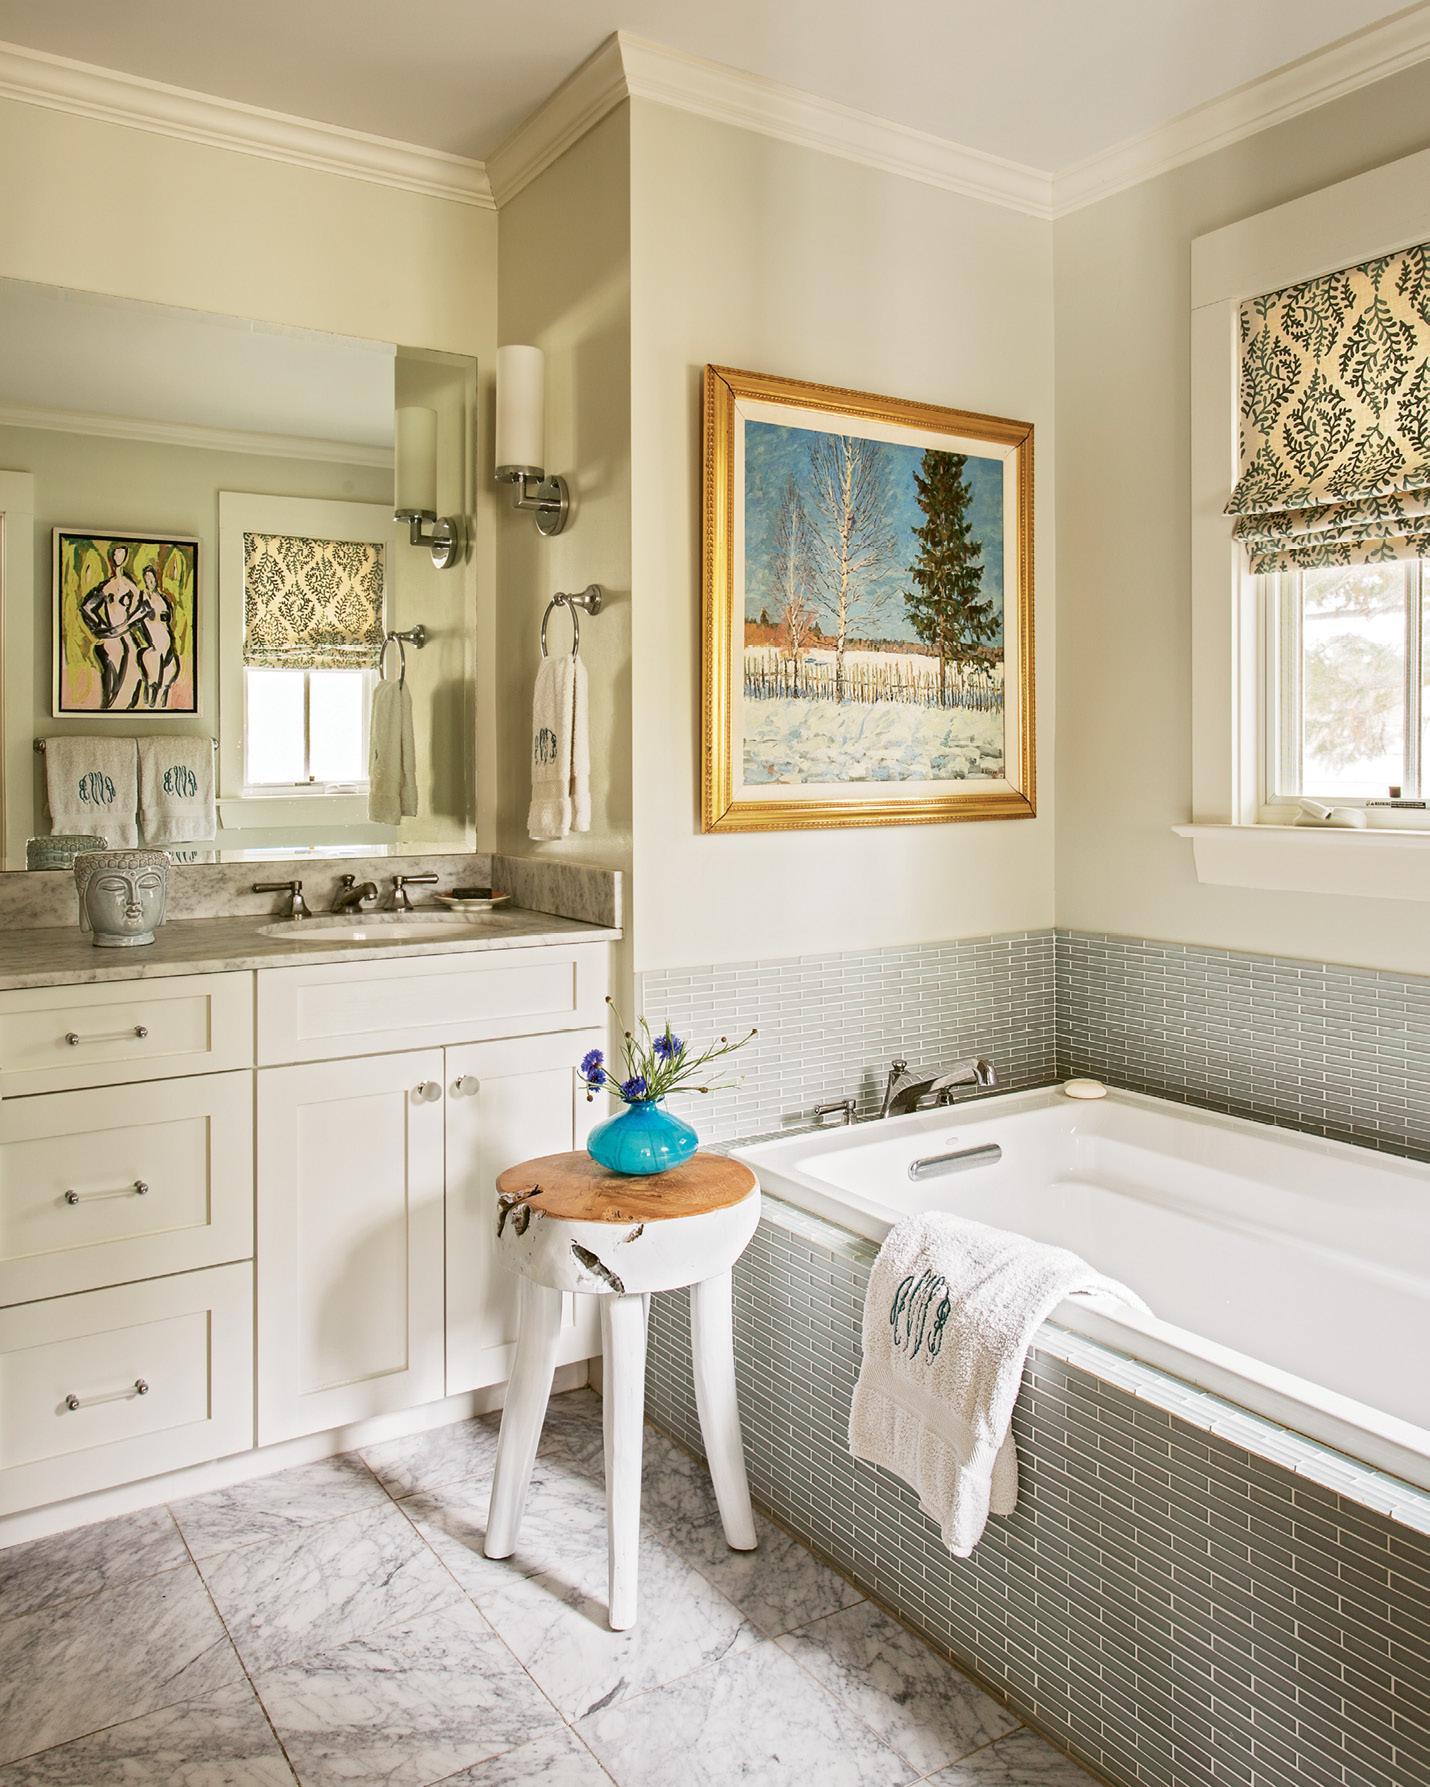 A piece by Charleston Artist Collective artist Anne Darby Parker reflects in the bath mirror.